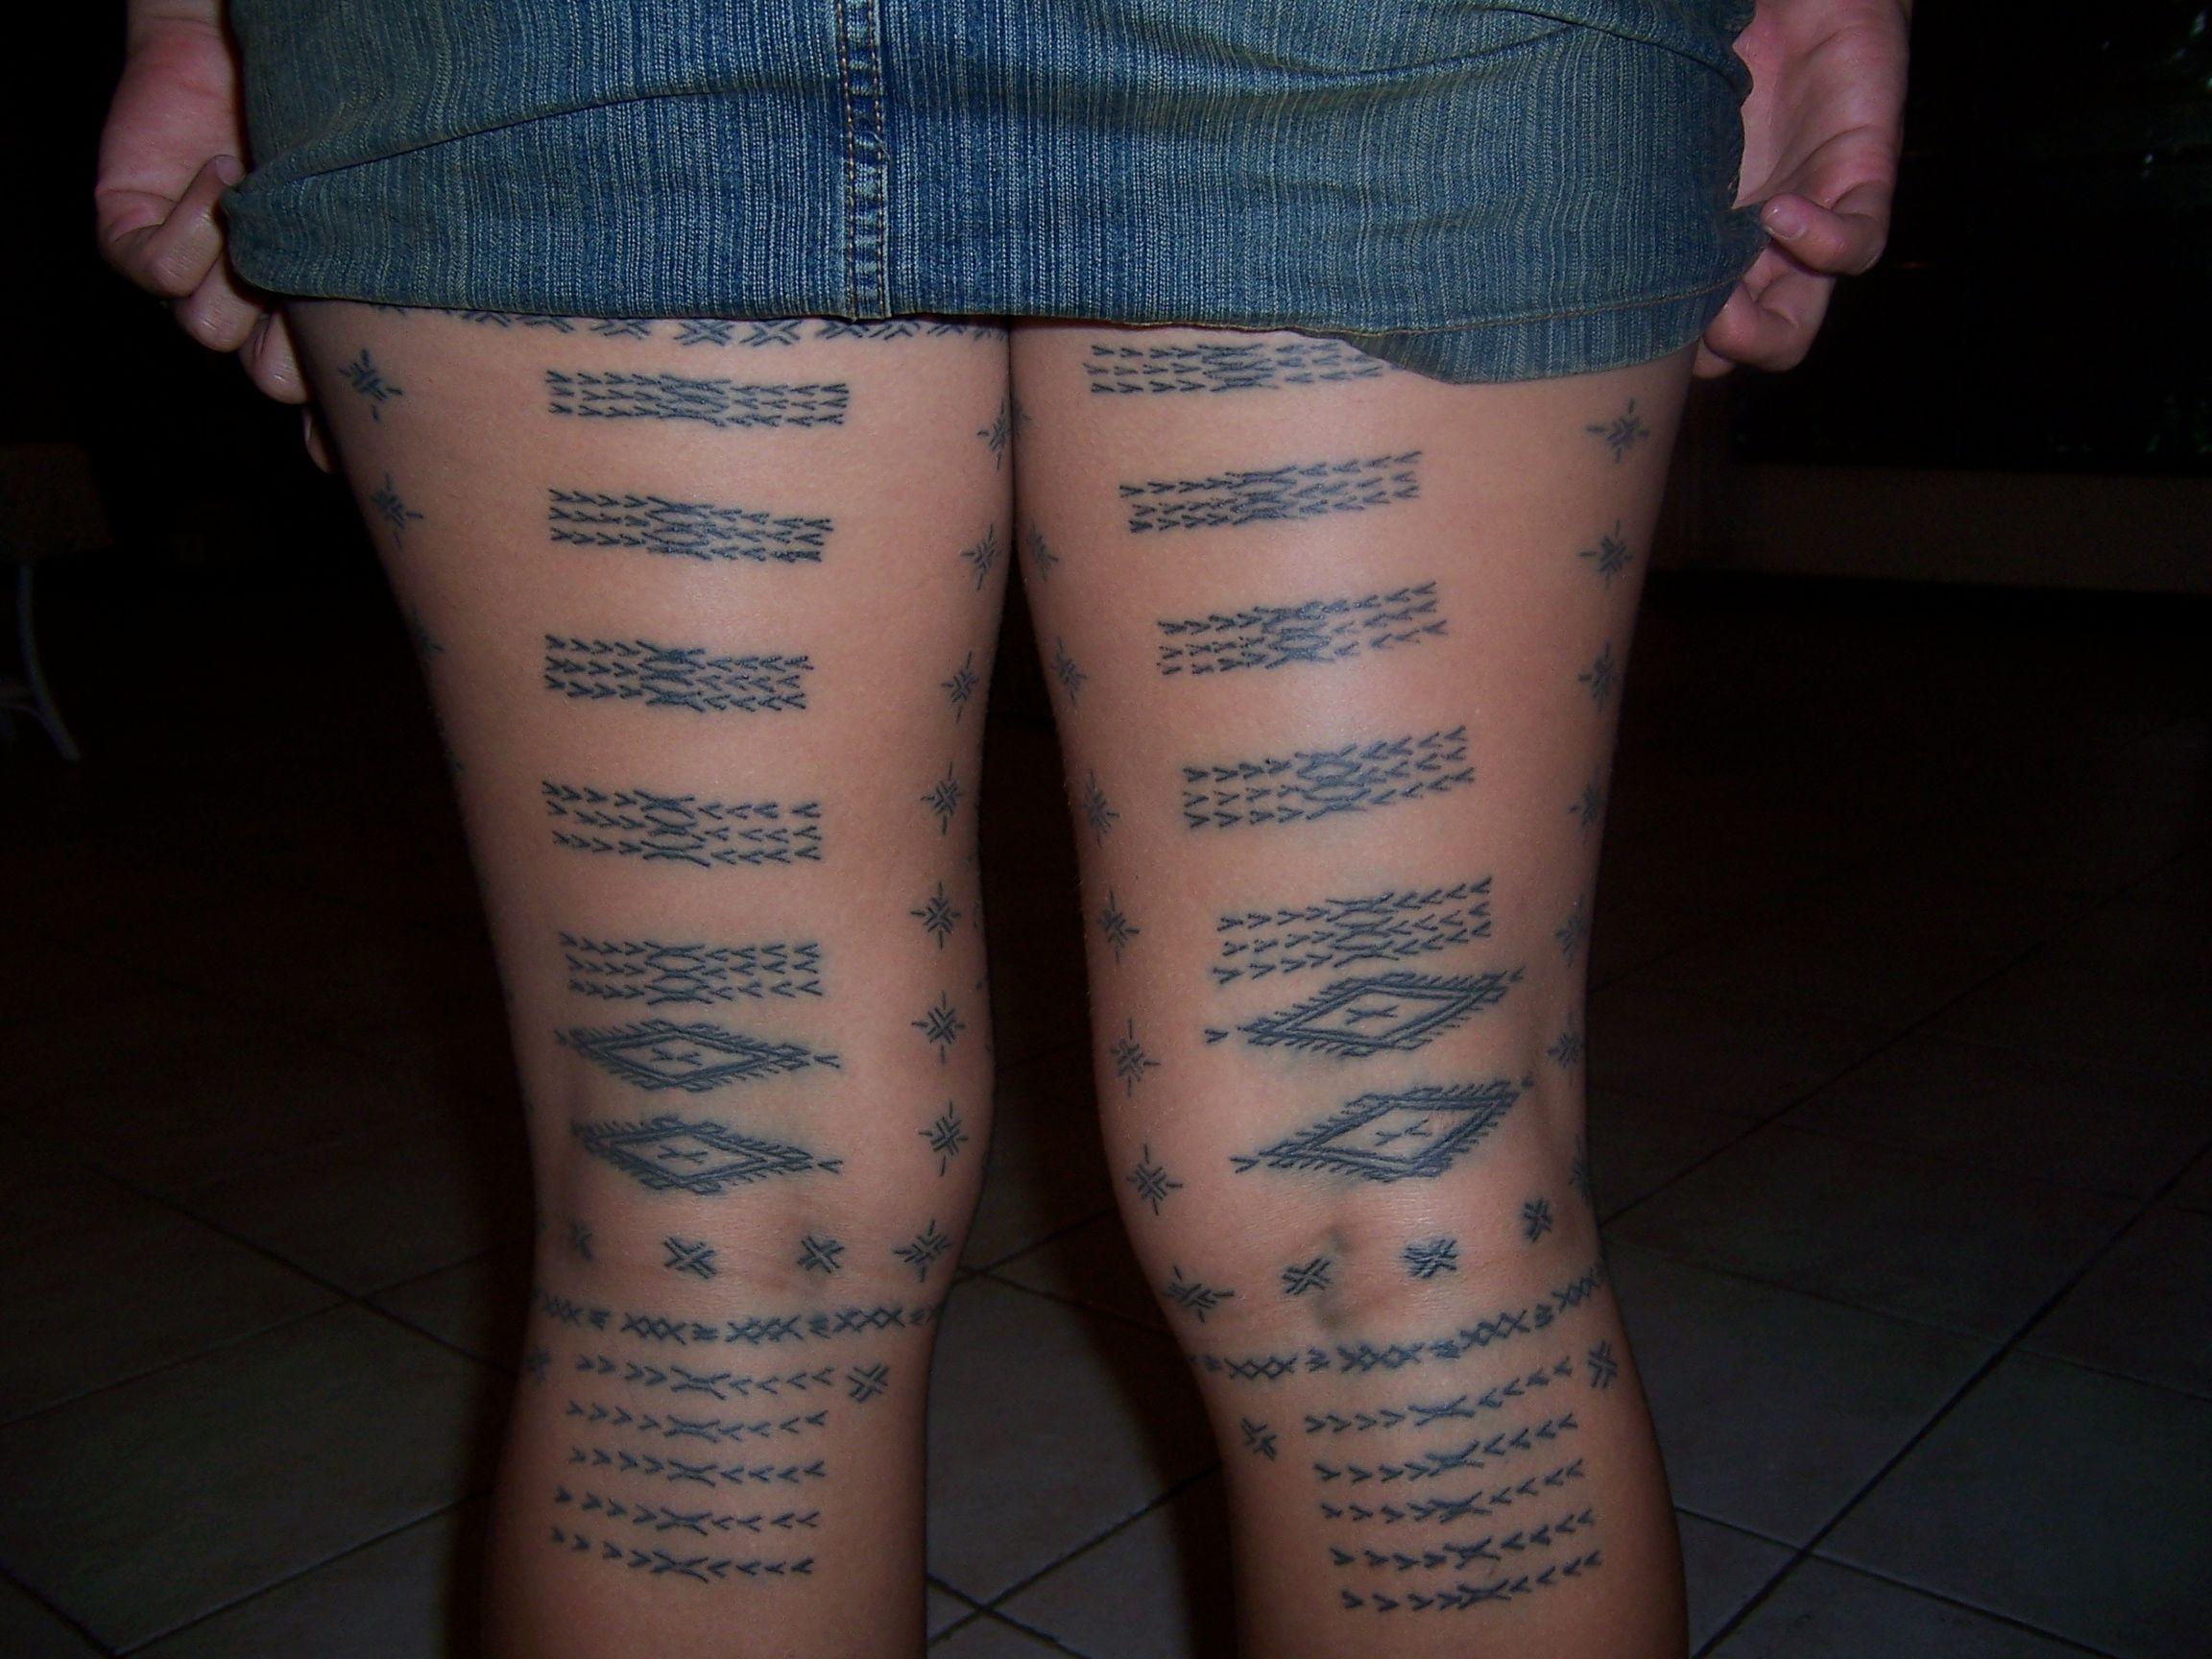 Samoan woman with a traditional malu tattoo cross cultural